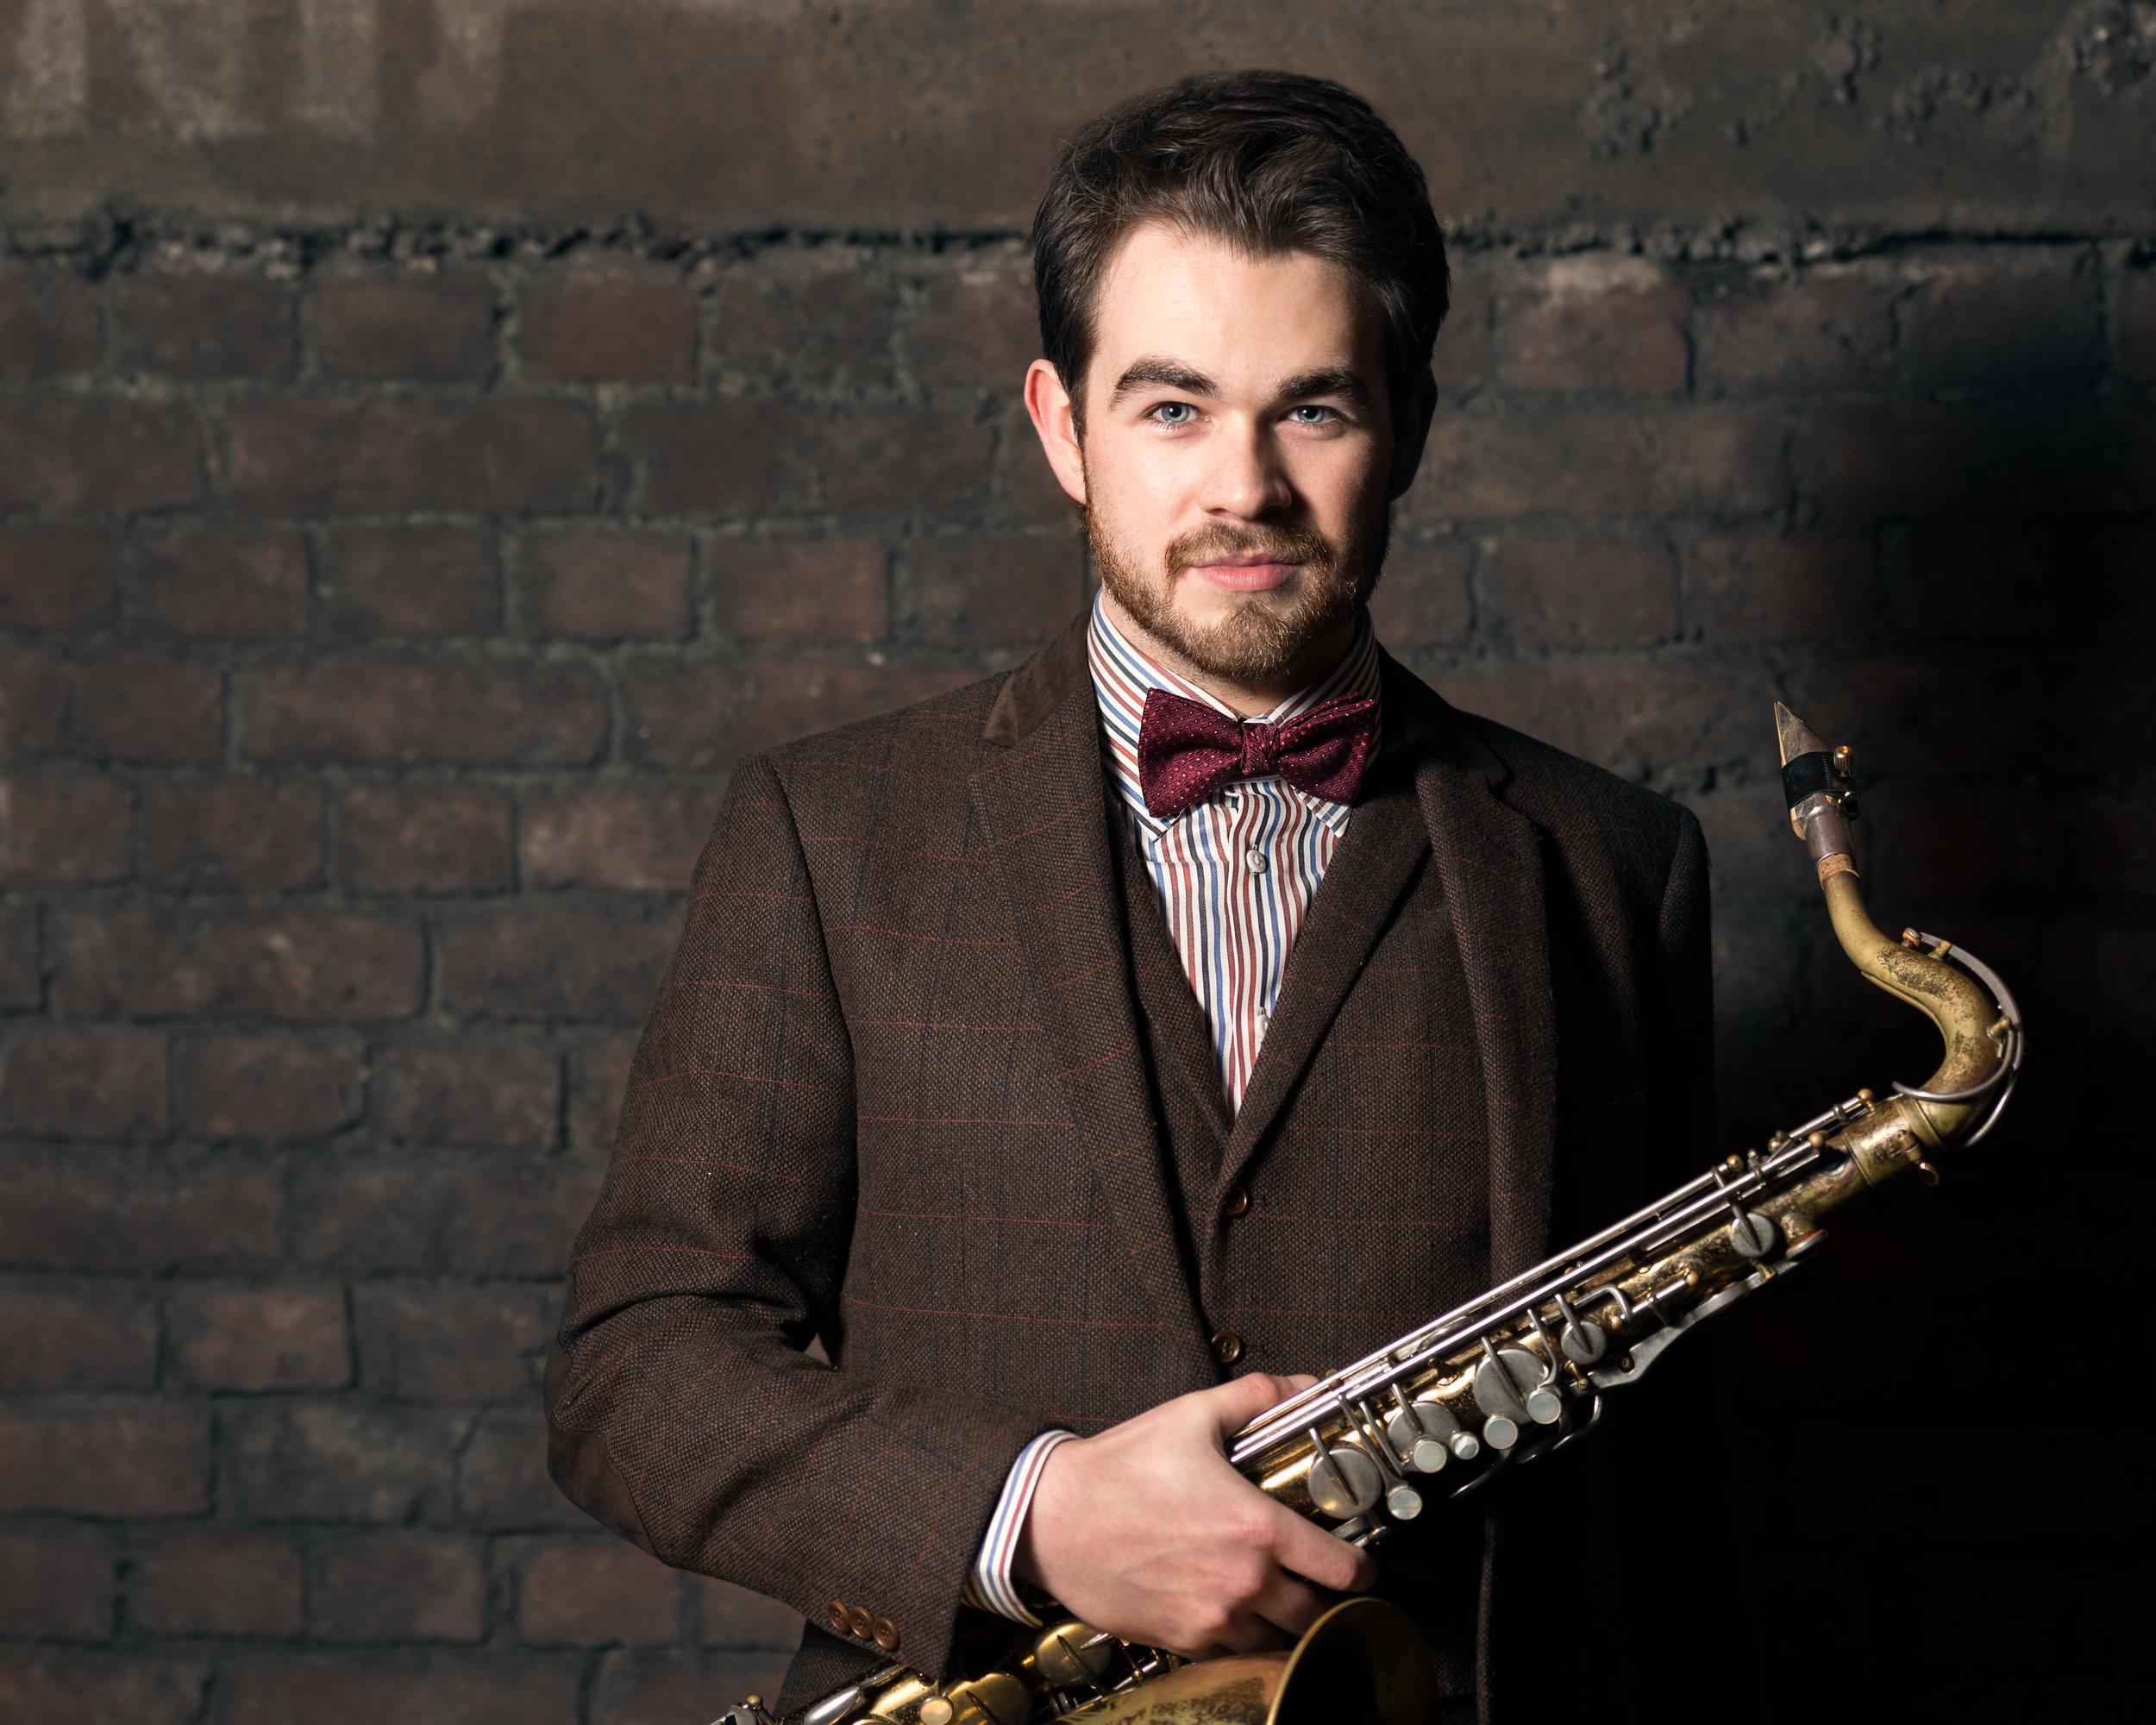 Sax/Clarinet